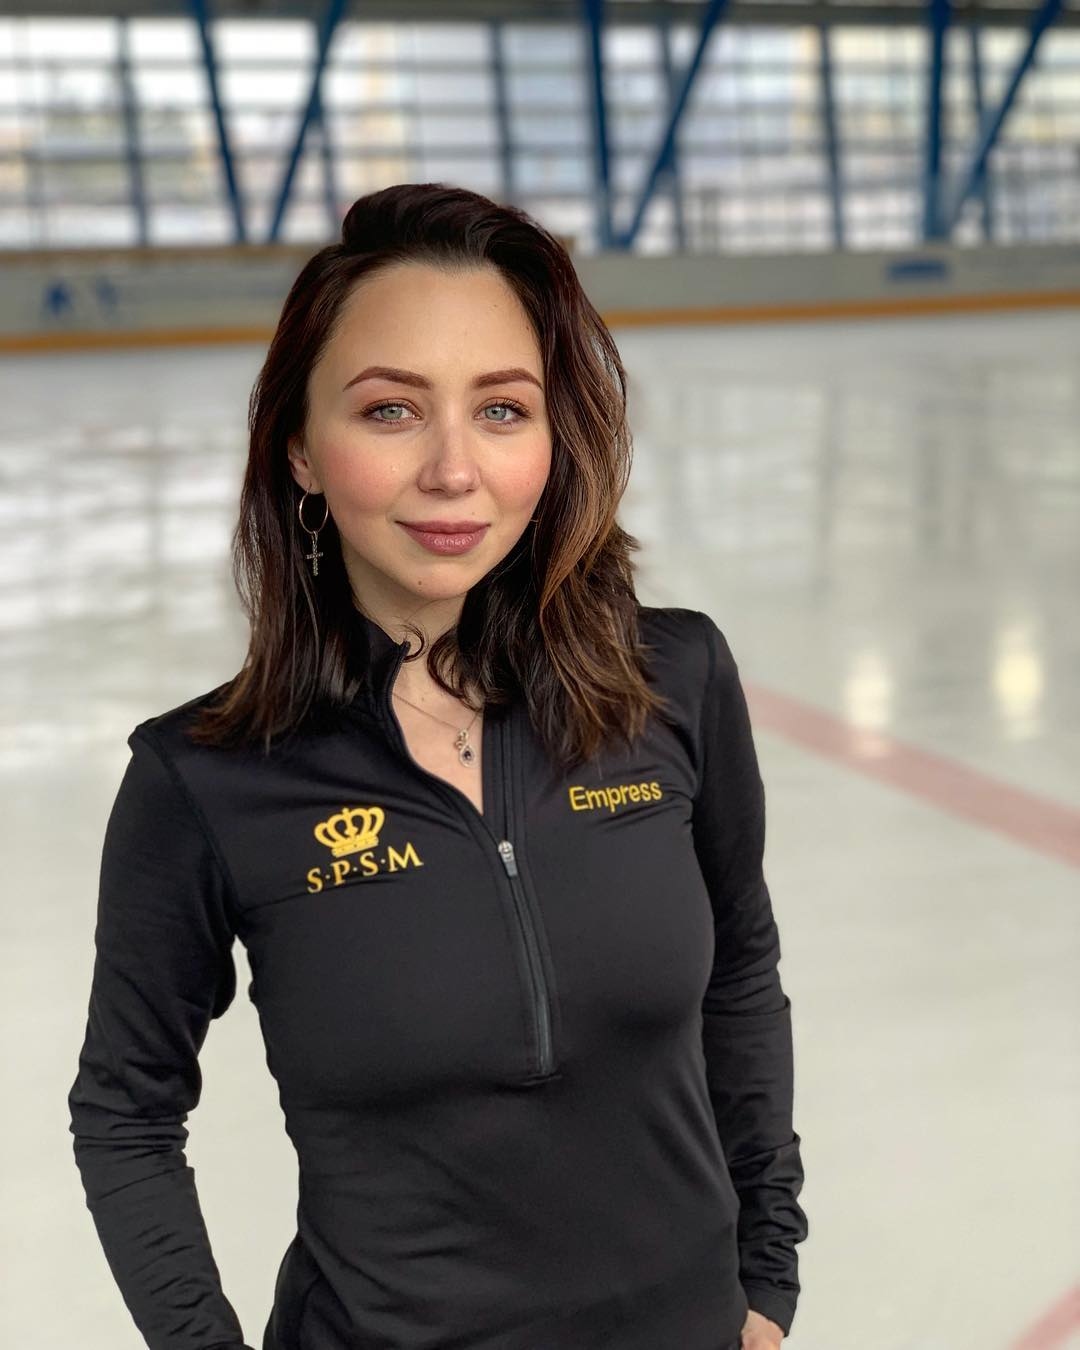 Елизавета Туктамышева & Андрей Лазукин - 5 - Страница 6 5cDaCSOvkGM